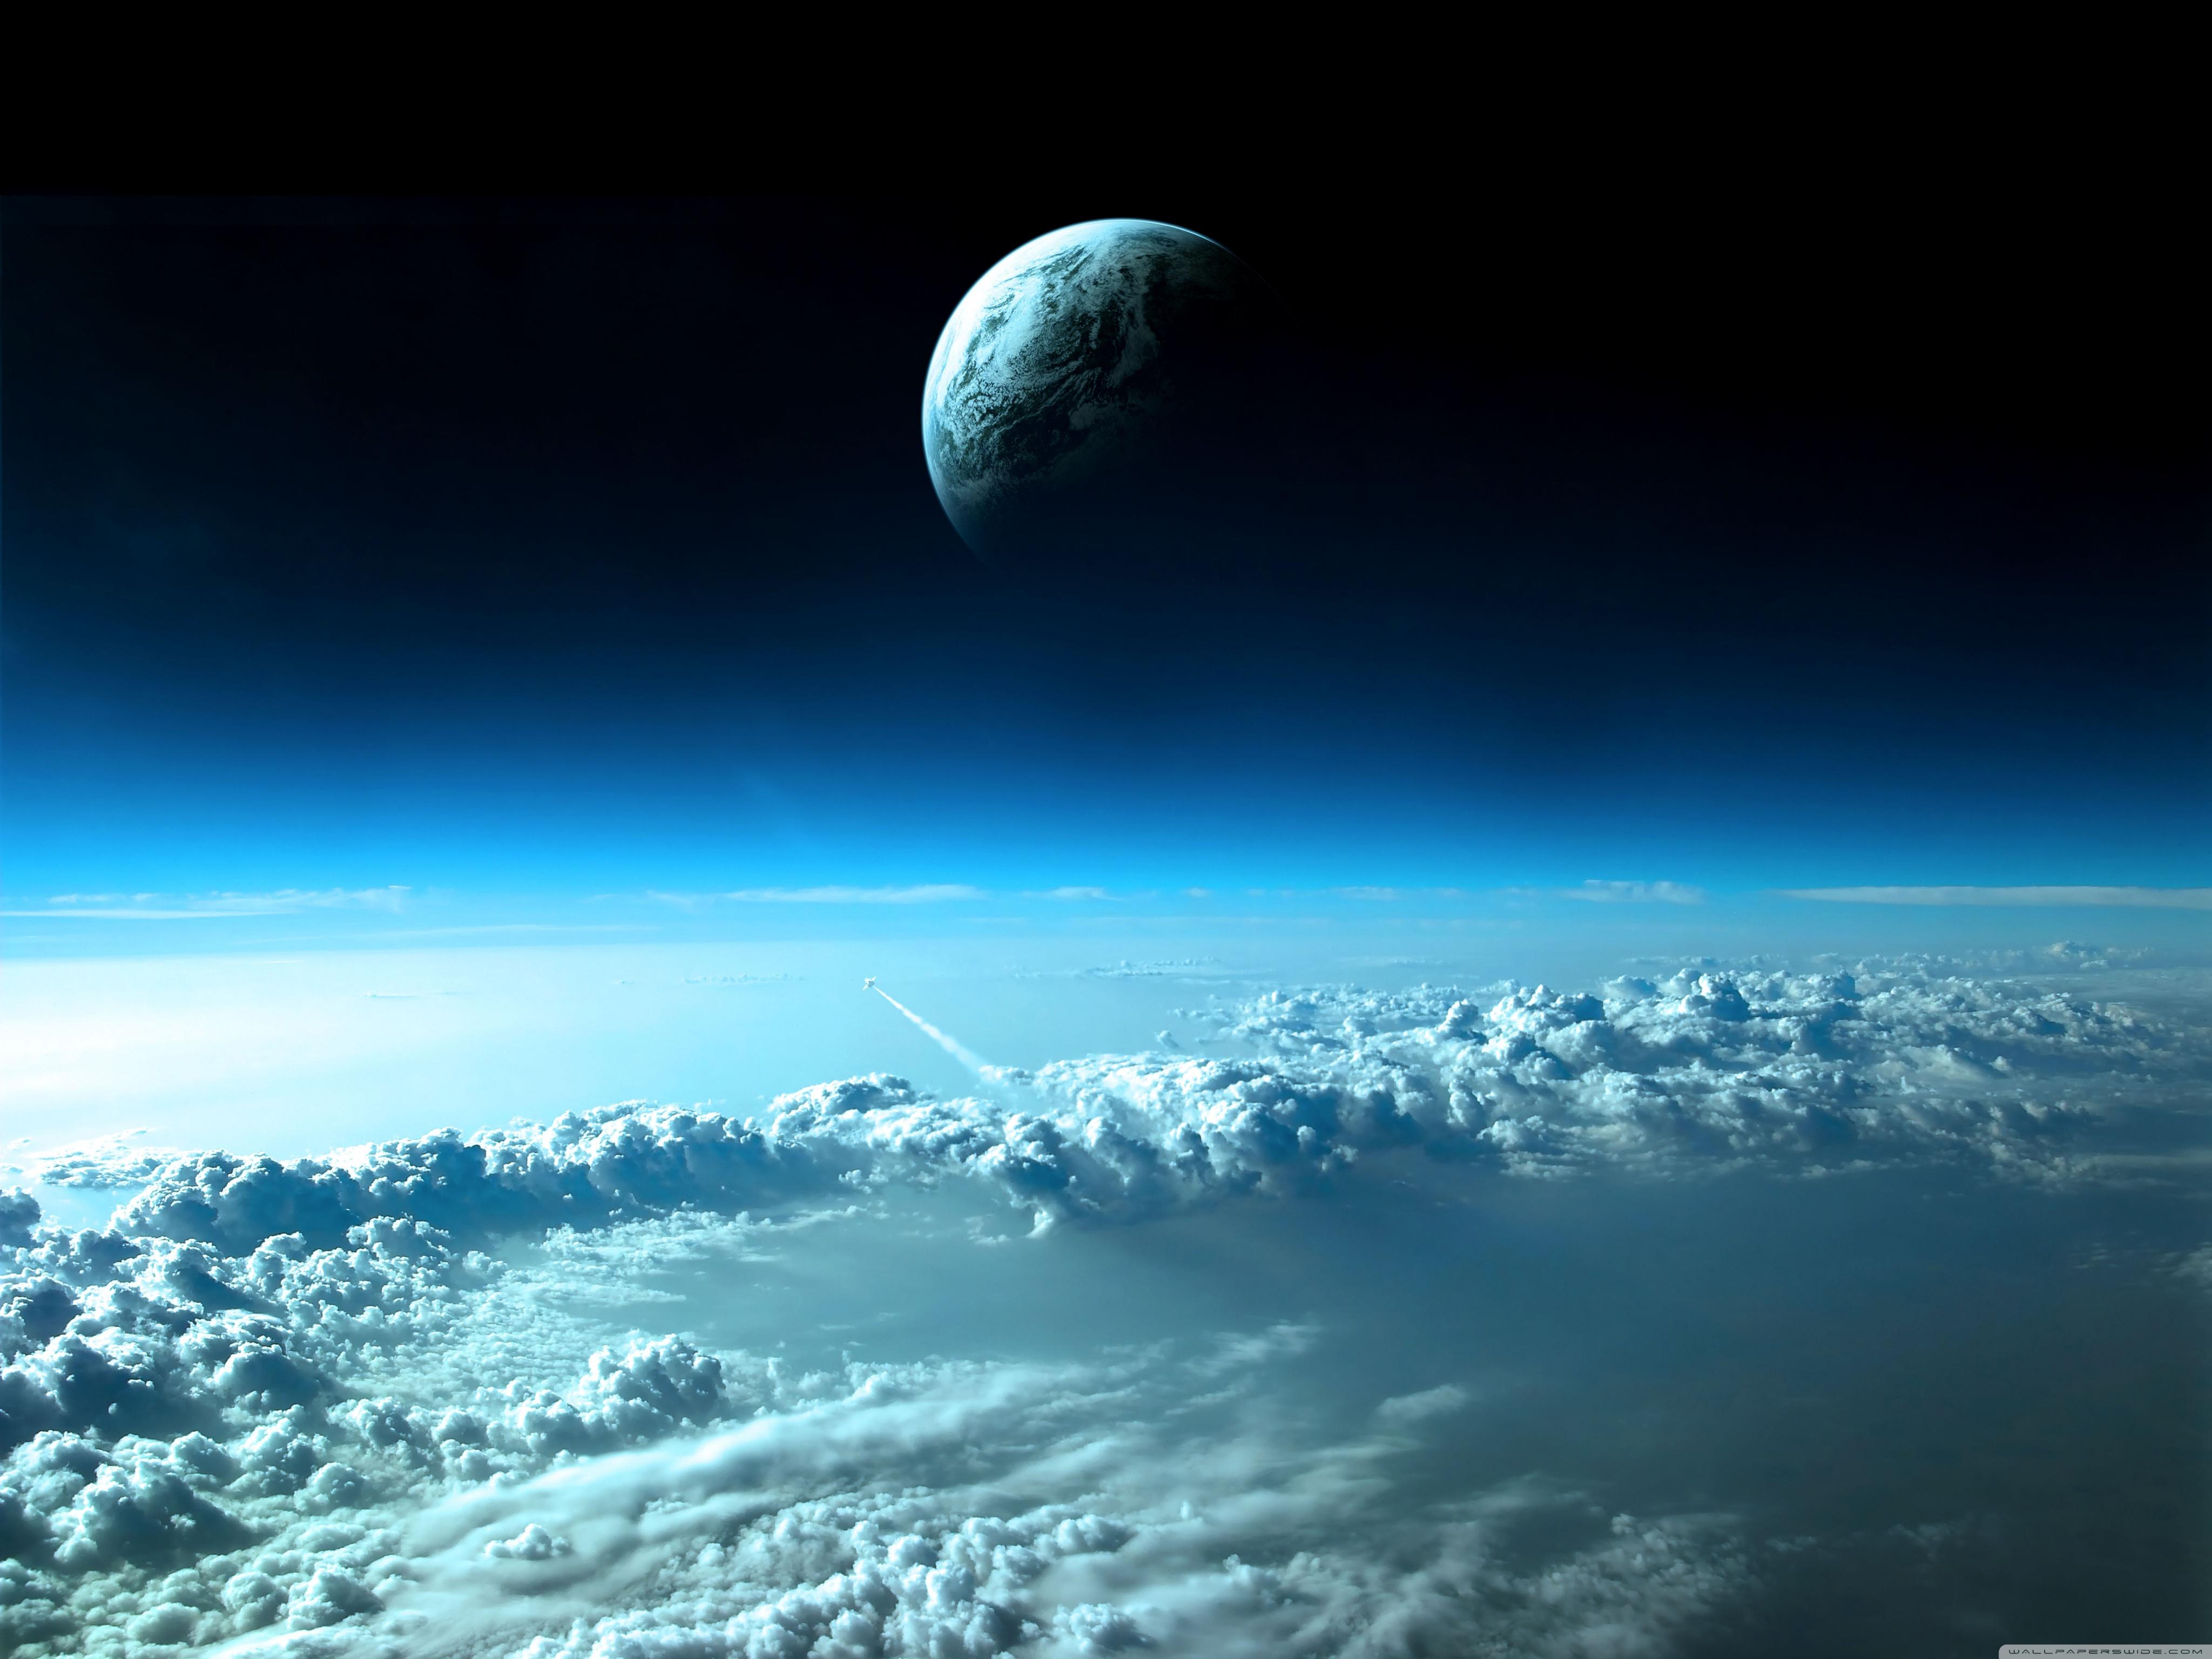 Beautiful Space View 4K Wallpaper Wide Screen Wallpaper 1080p2K4K 4096x3072